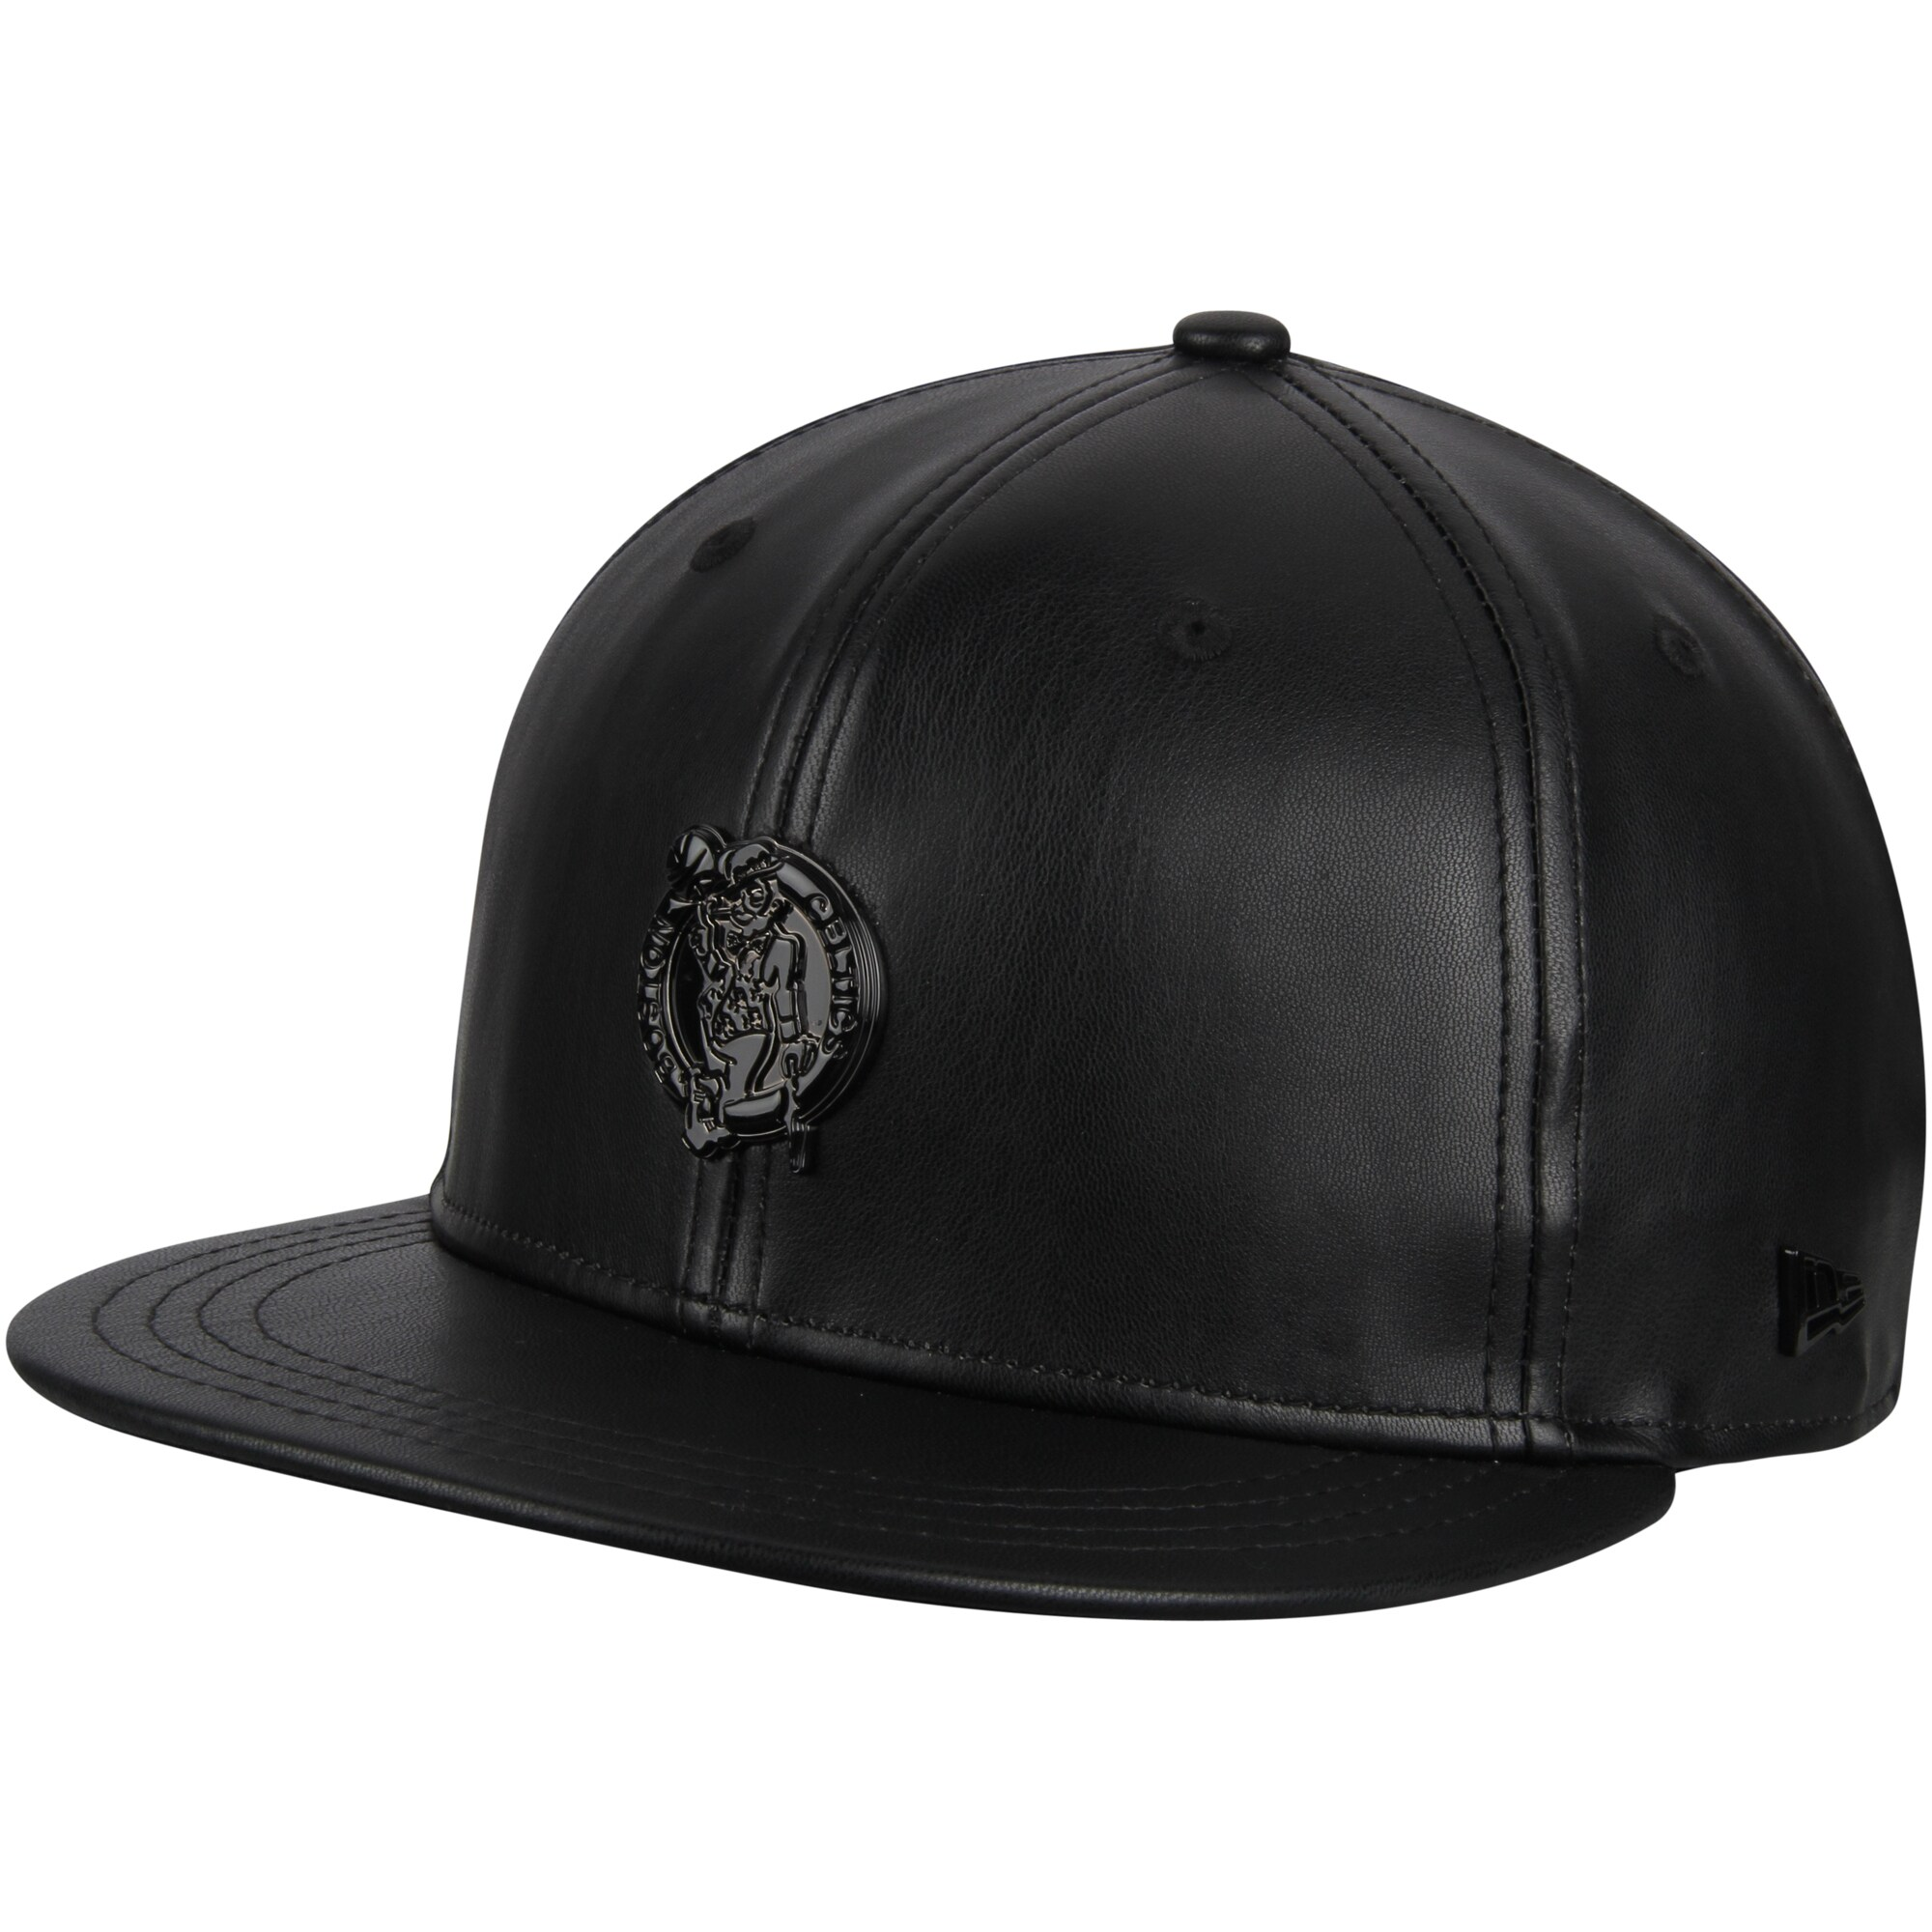 Boston Celtics New Era Black Label Series Glossy Metal 9FIFTY Snapback Adjustable Hat - Black